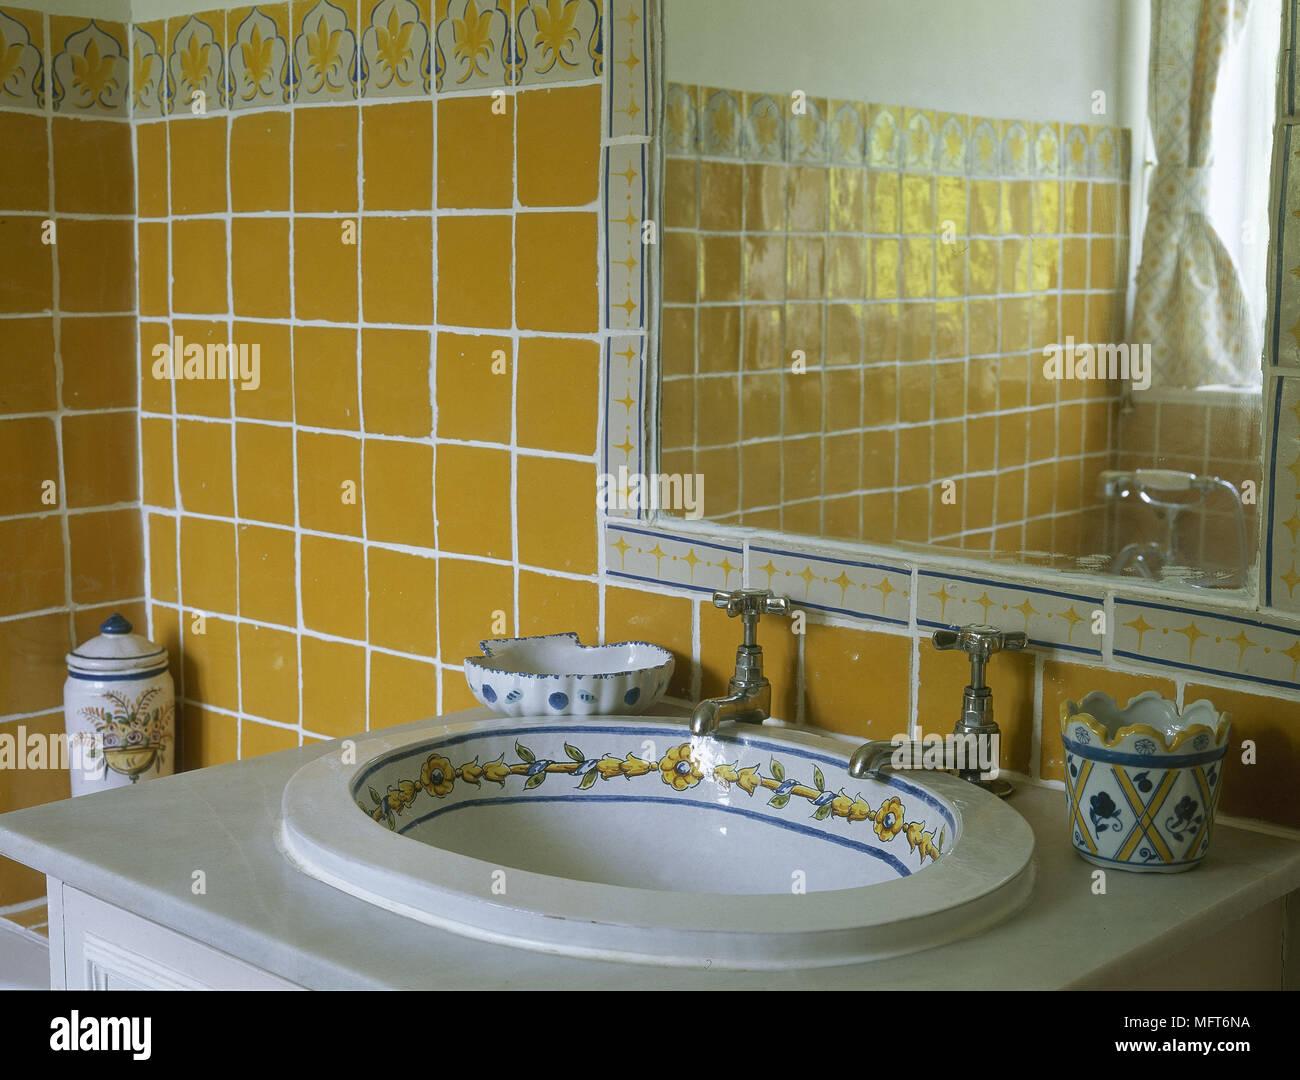 Bagno giallo cool bagno moderno grigio fresco arredo bagno giallo